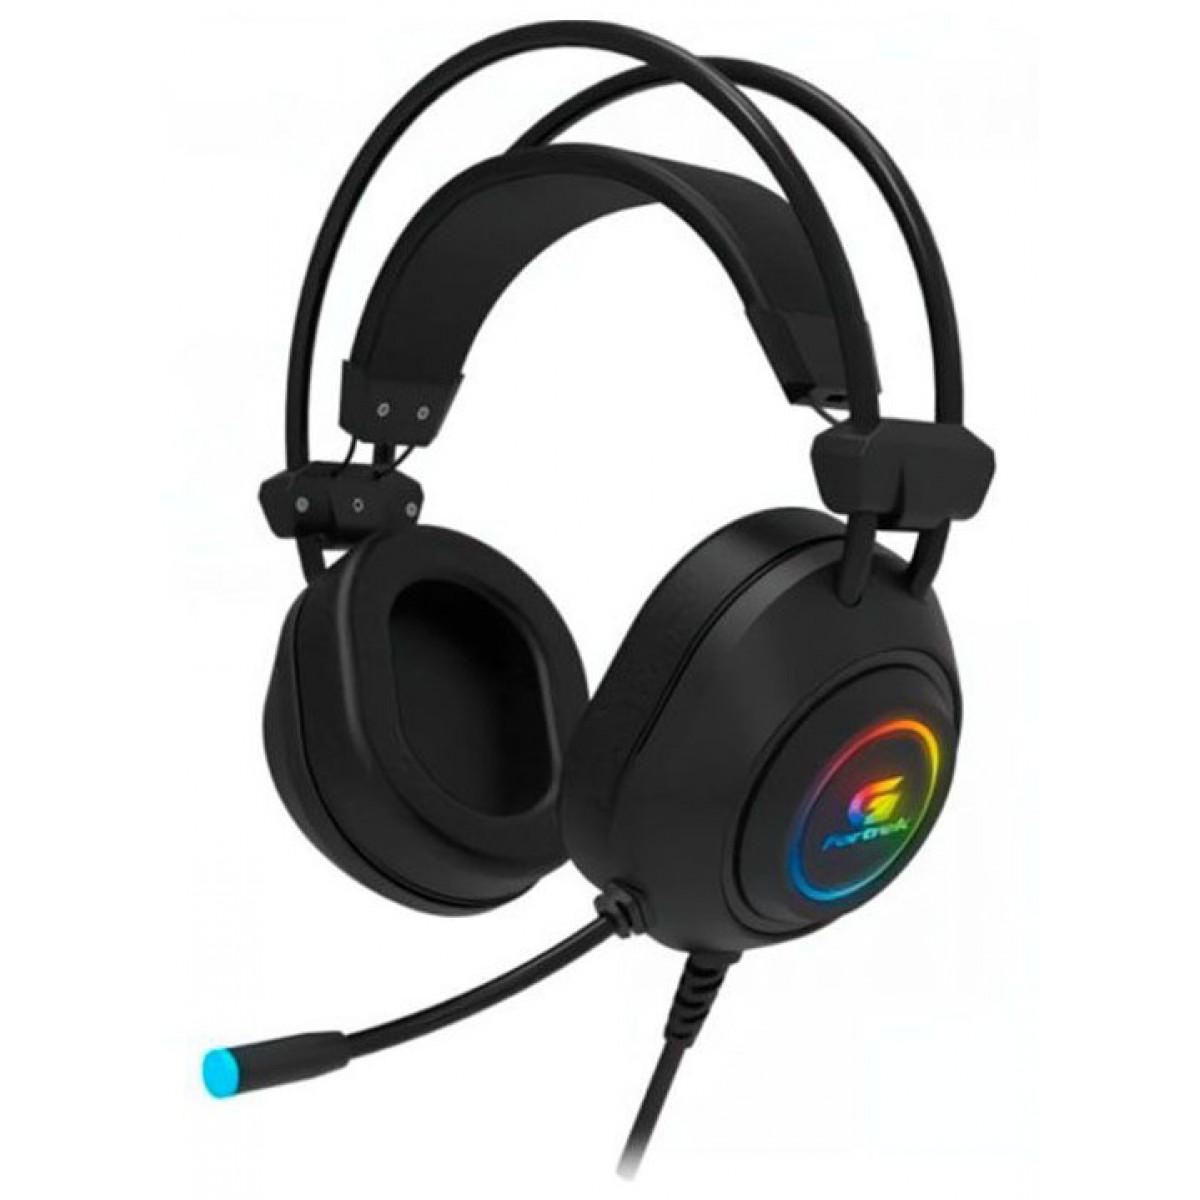 Headset Gamer Fortrek Crusader, Rainbow, USB, Preto, 70555